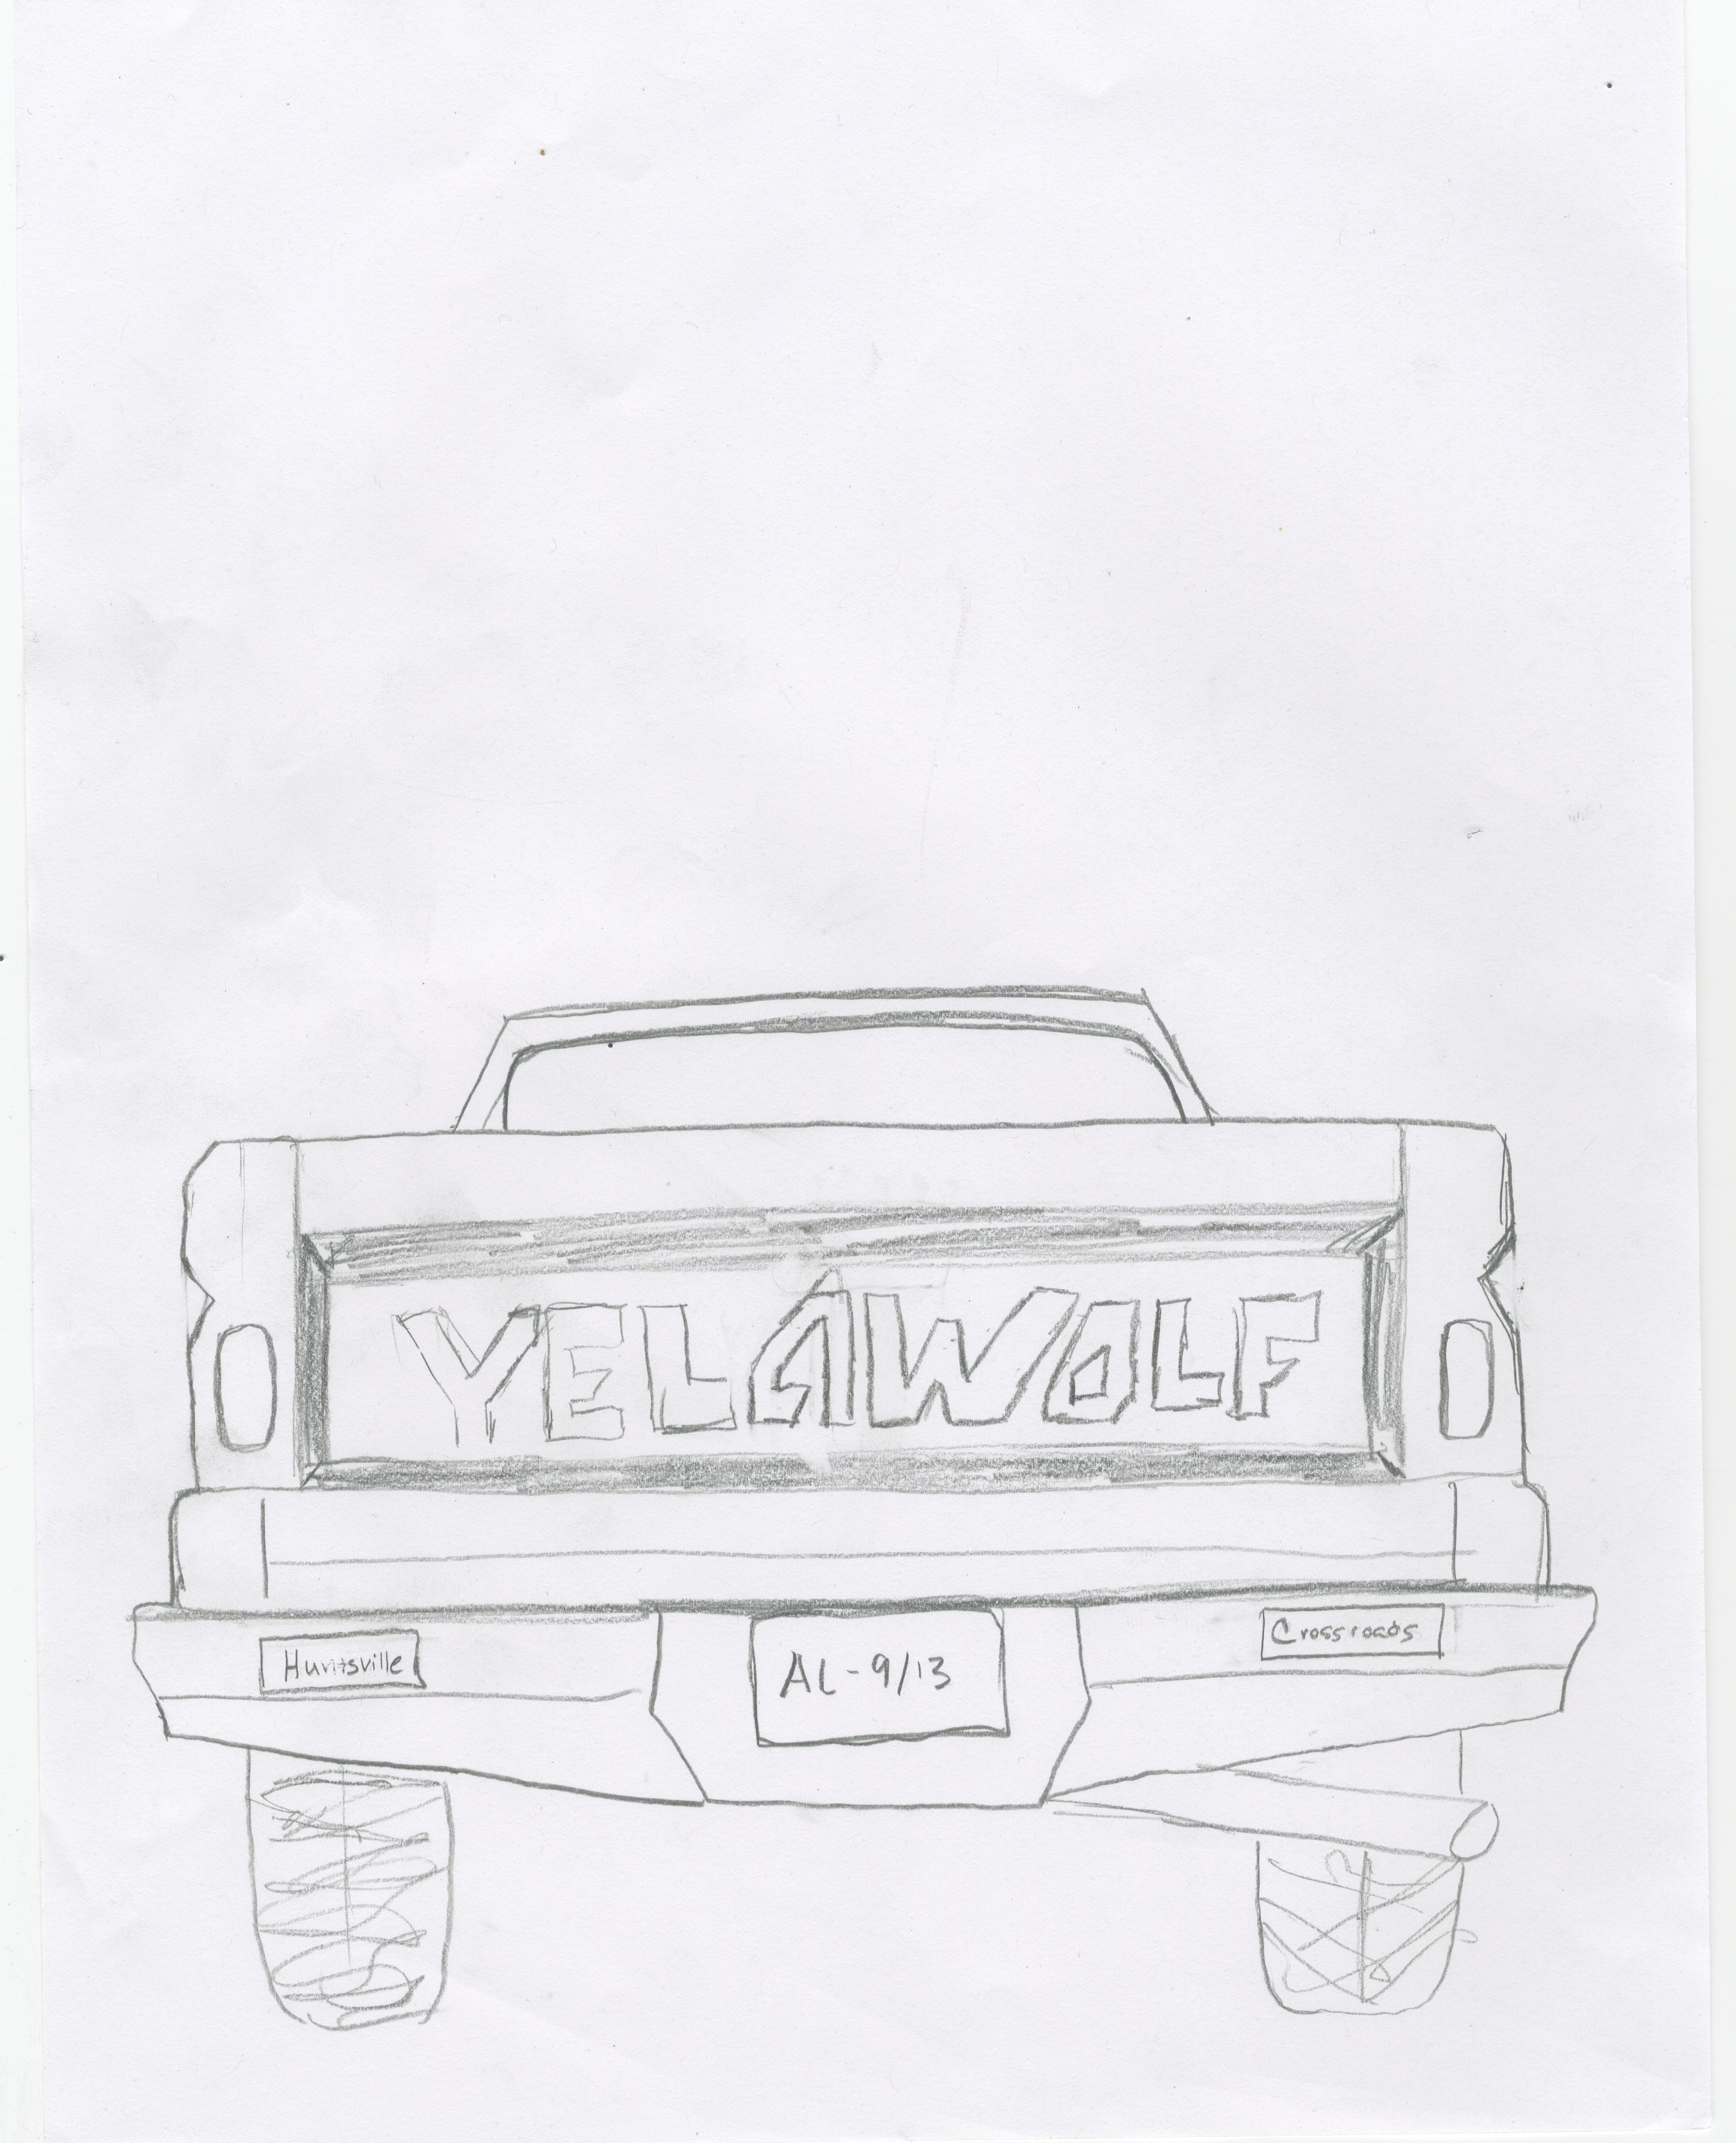 Yelawolf - image 3 - student project